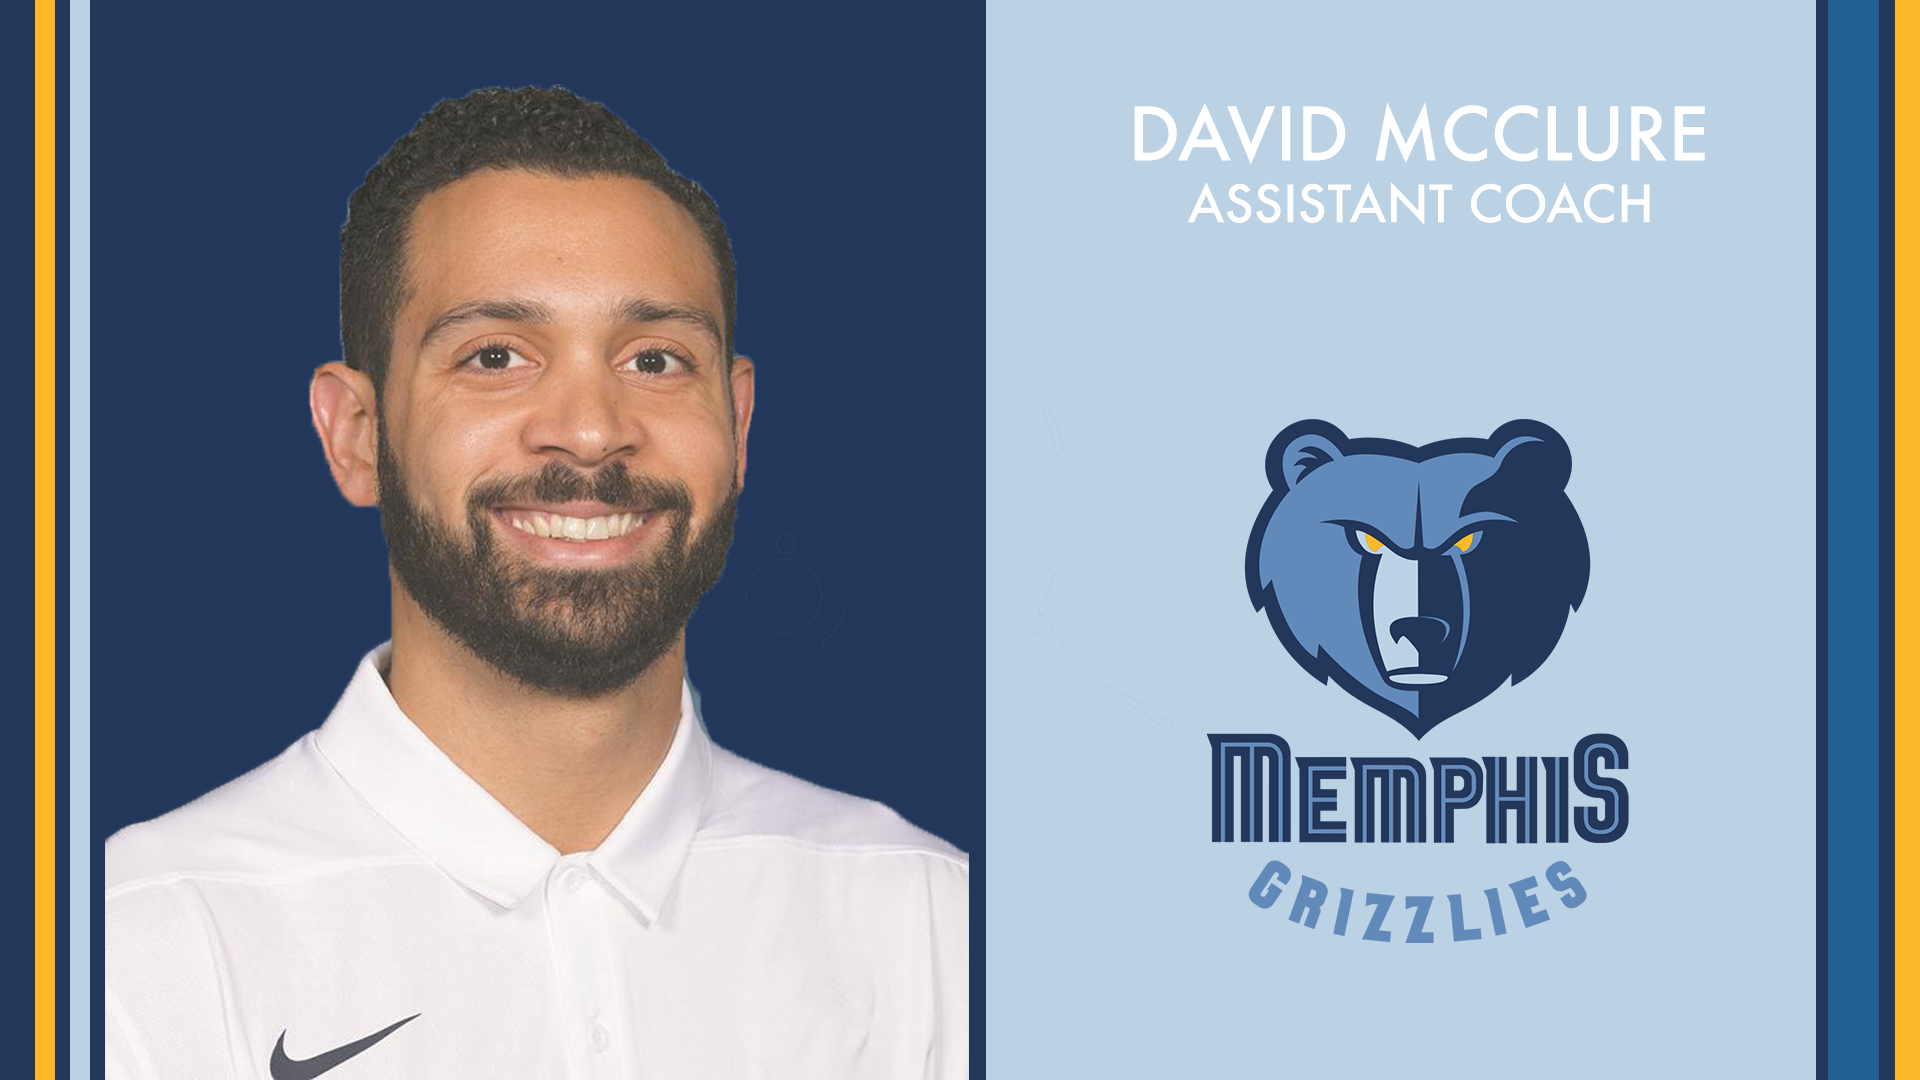 David McClure GRIZZLIES.png